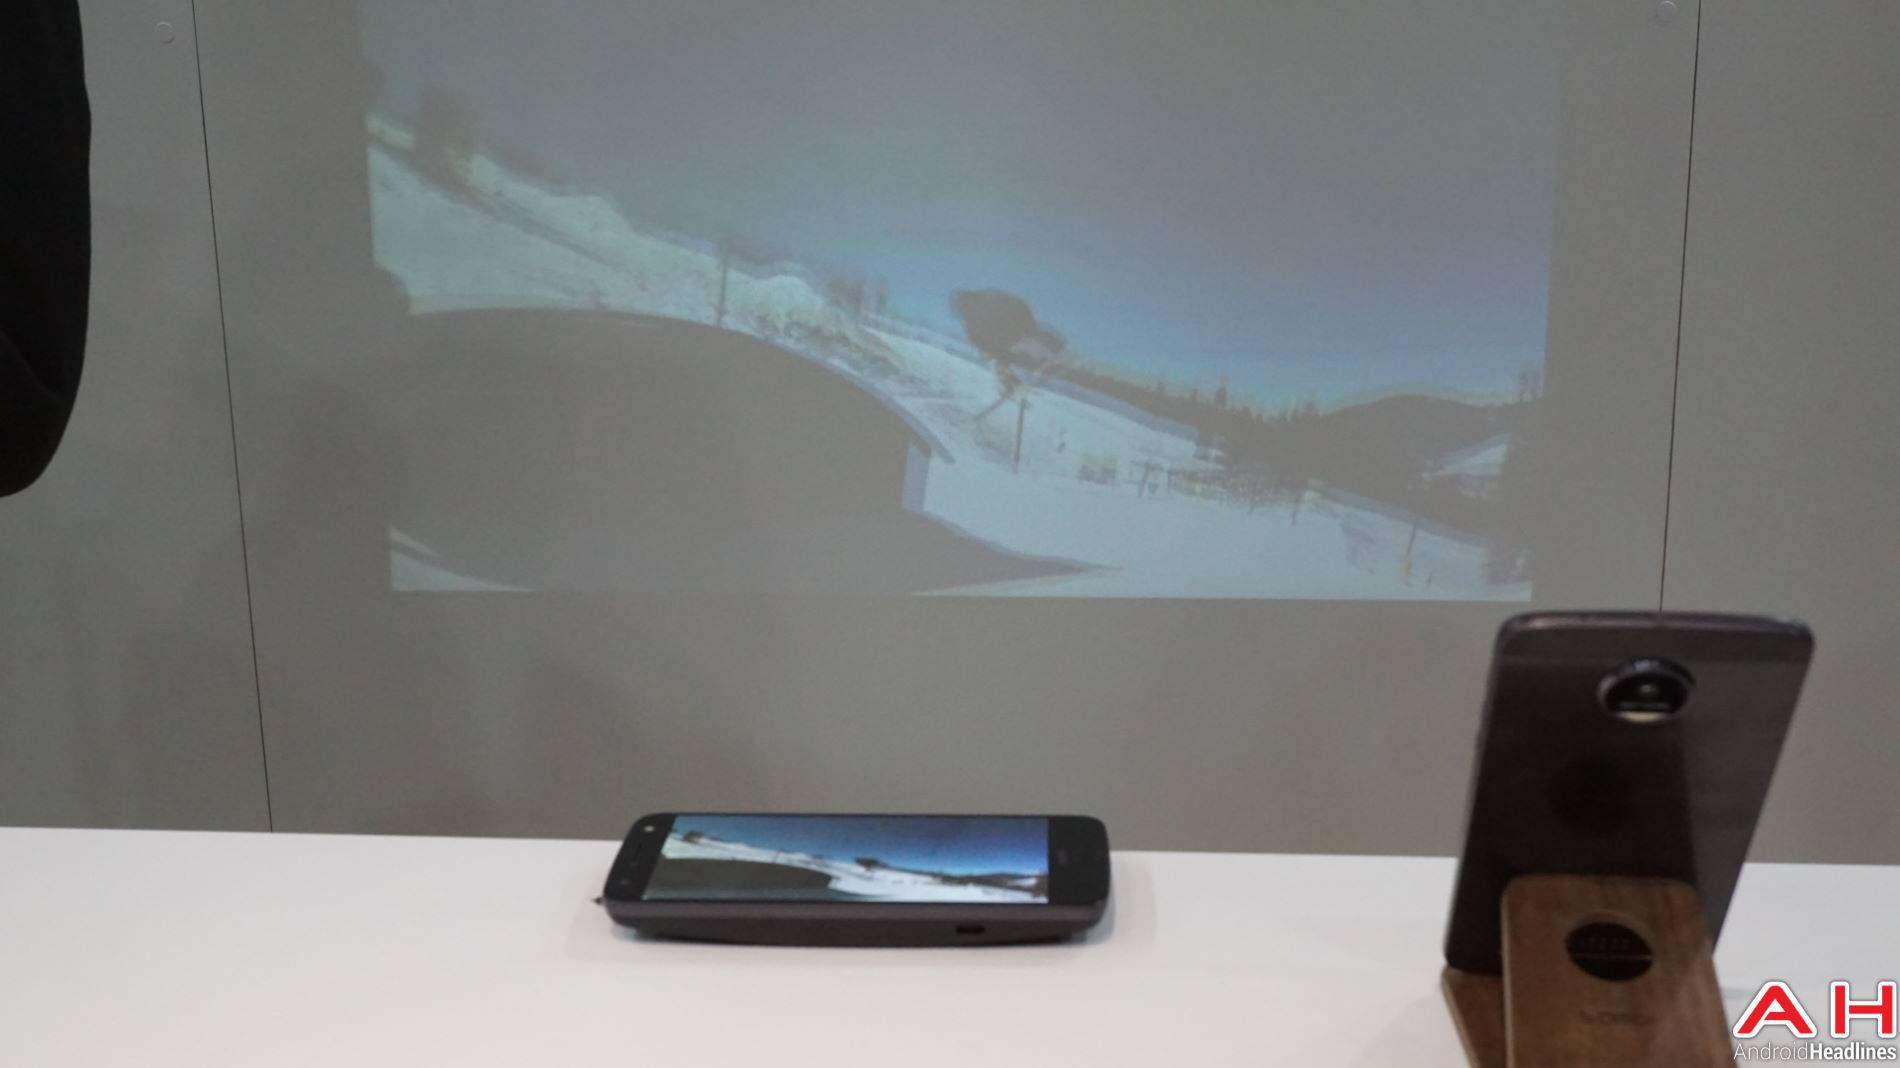 Moto Mods Lenovo Hands On AH 5 5